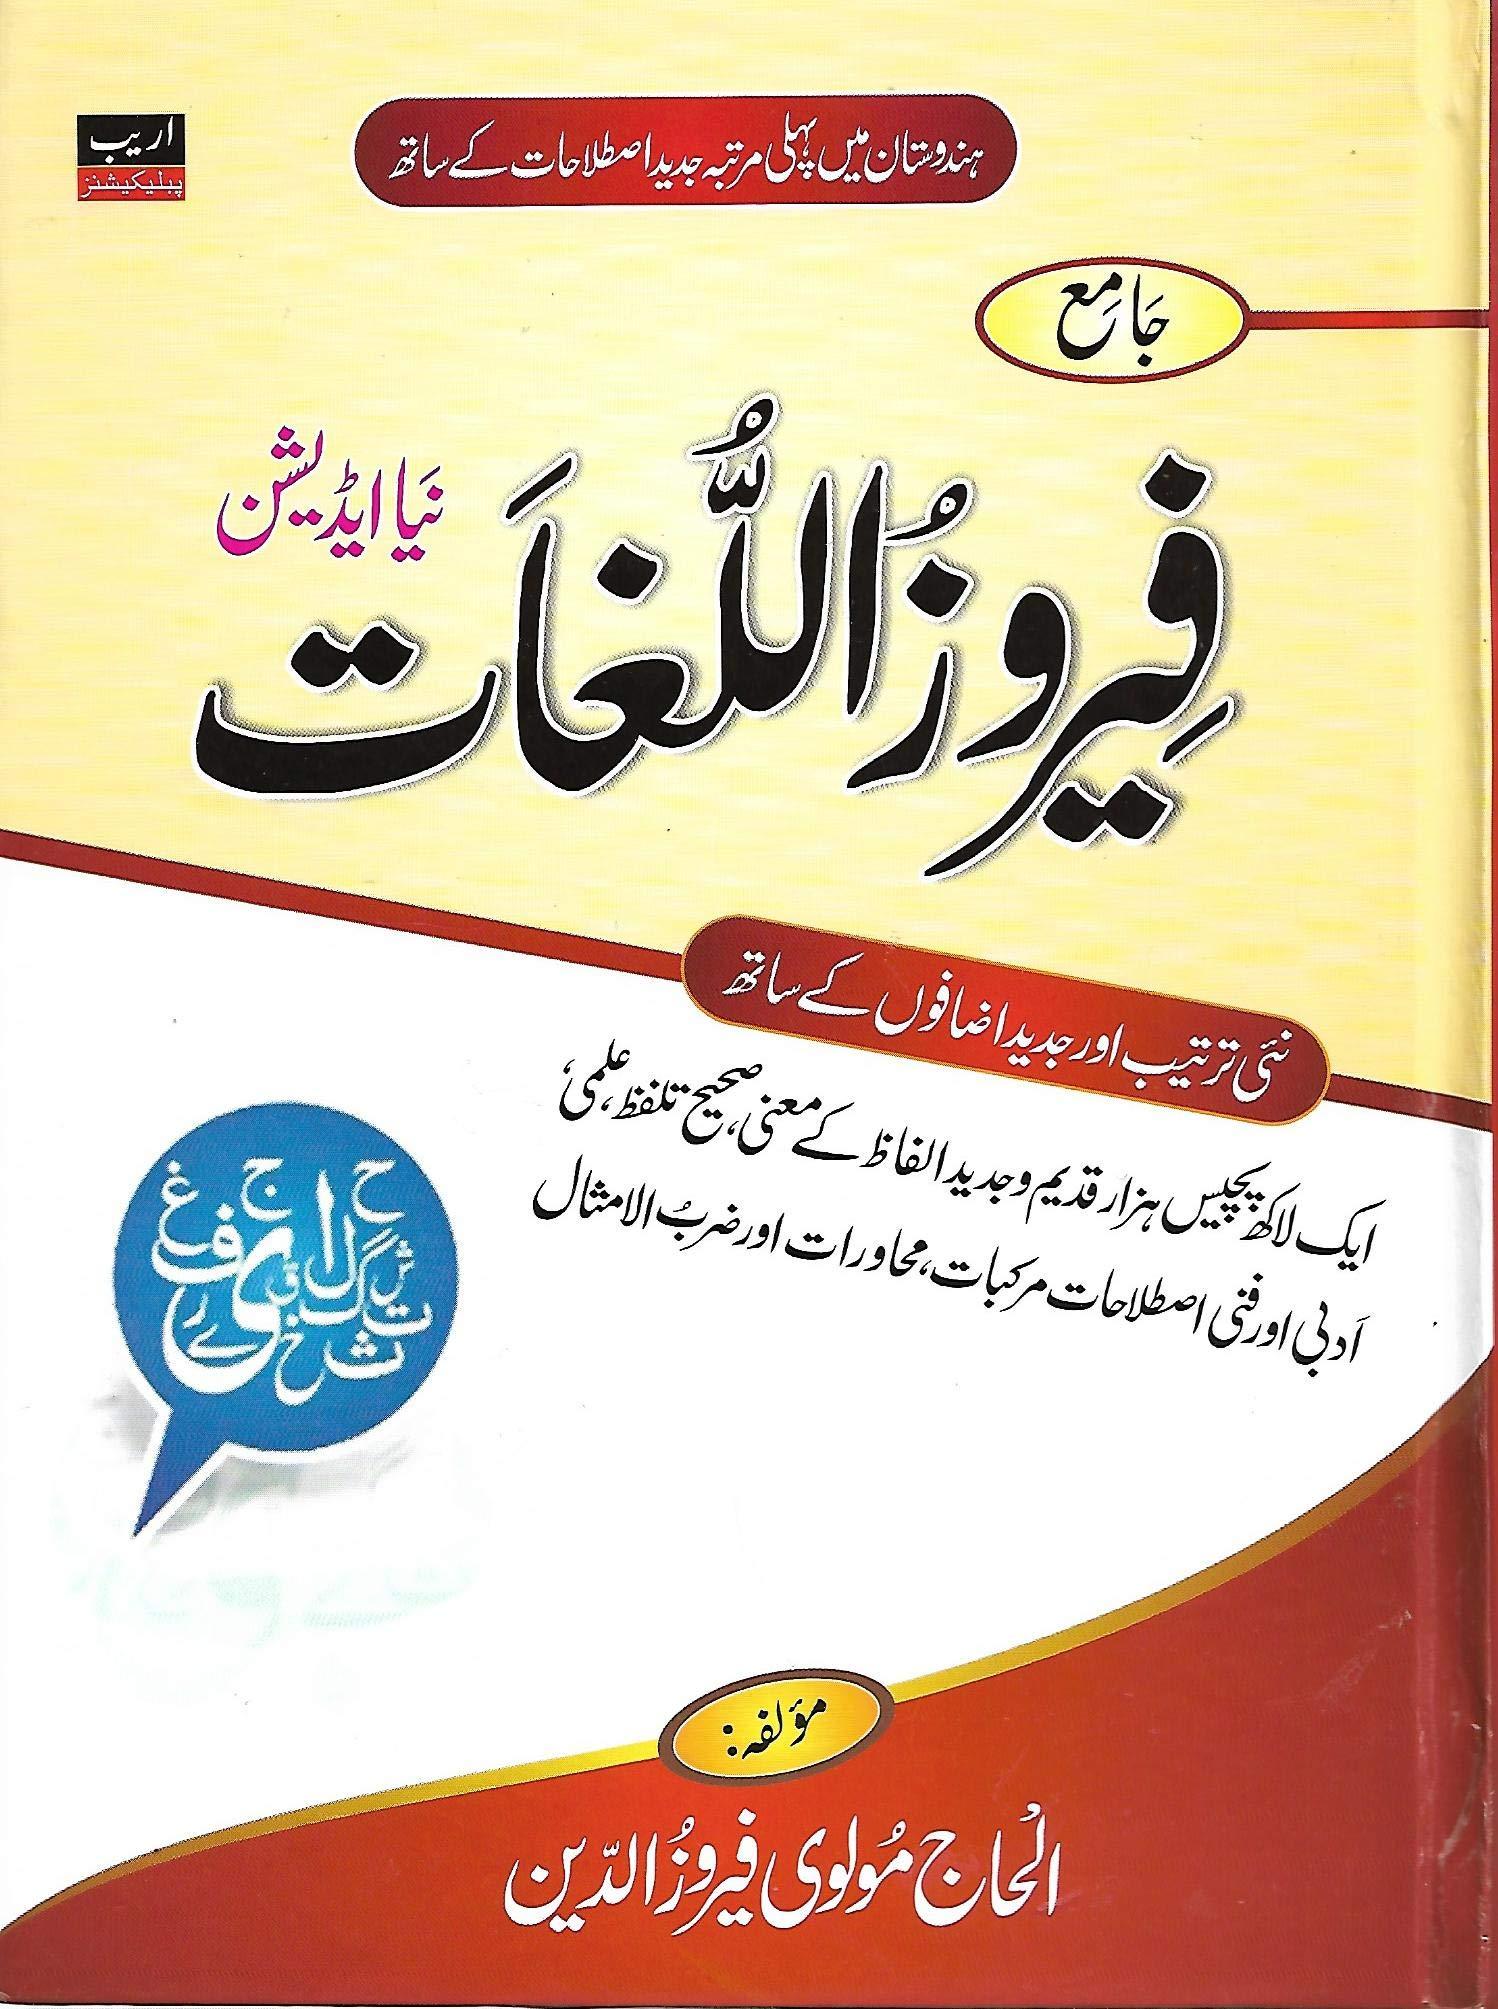 Buy Jame   Firozul   Lughat Urdu To Urdu Dictionary large Book ...